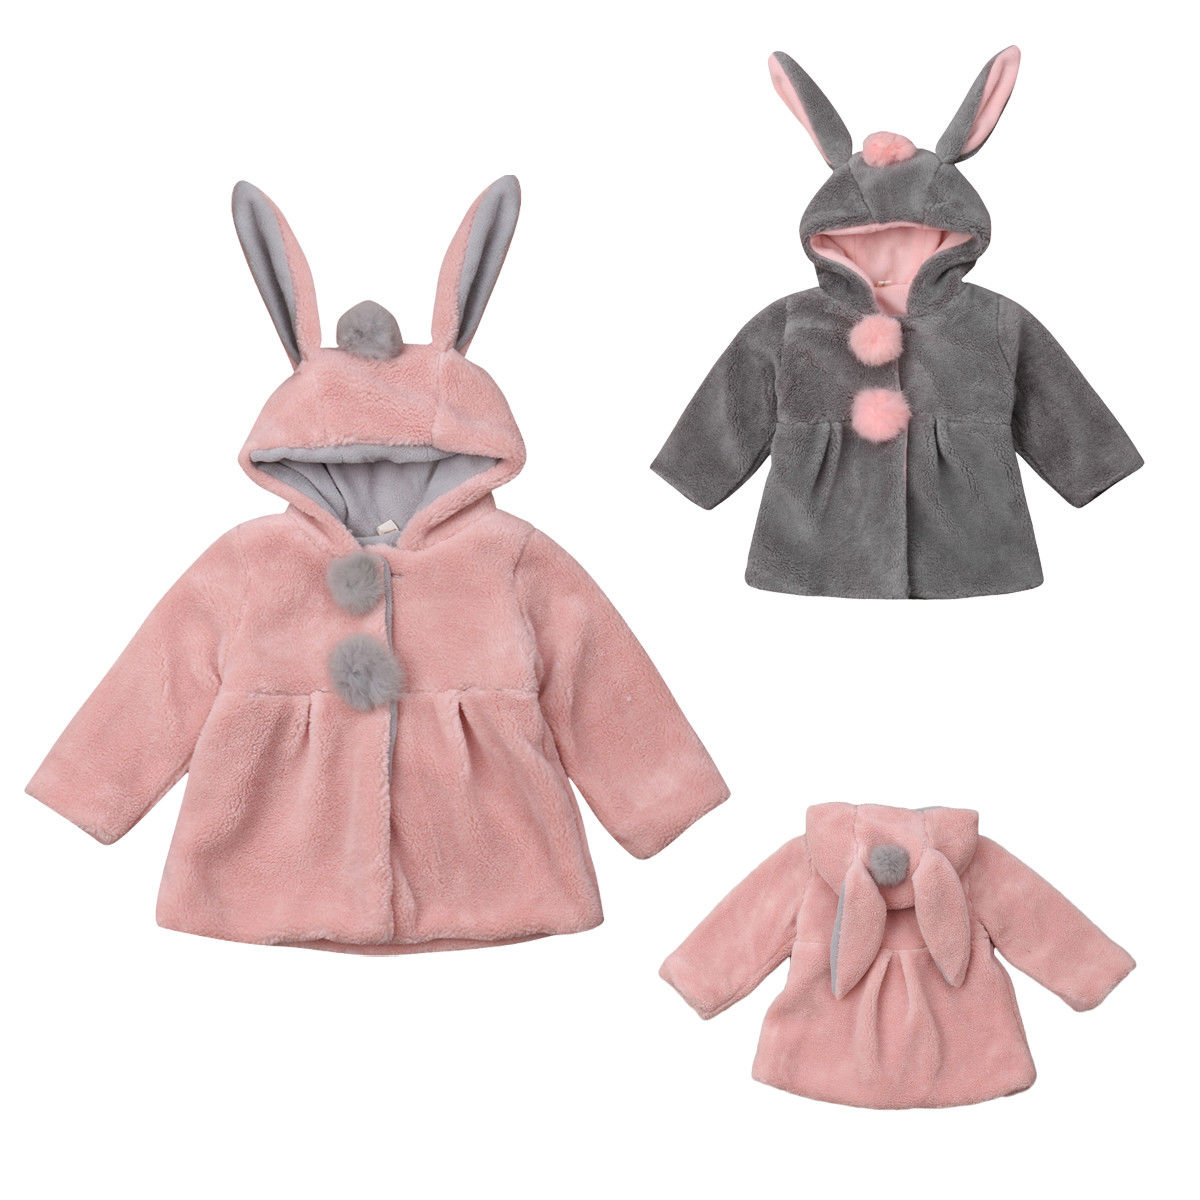 Toddler Baby Girls Cute Rabbit Print Hooded Coat Winter Thicken Warm Outwear Lightweight Jacket